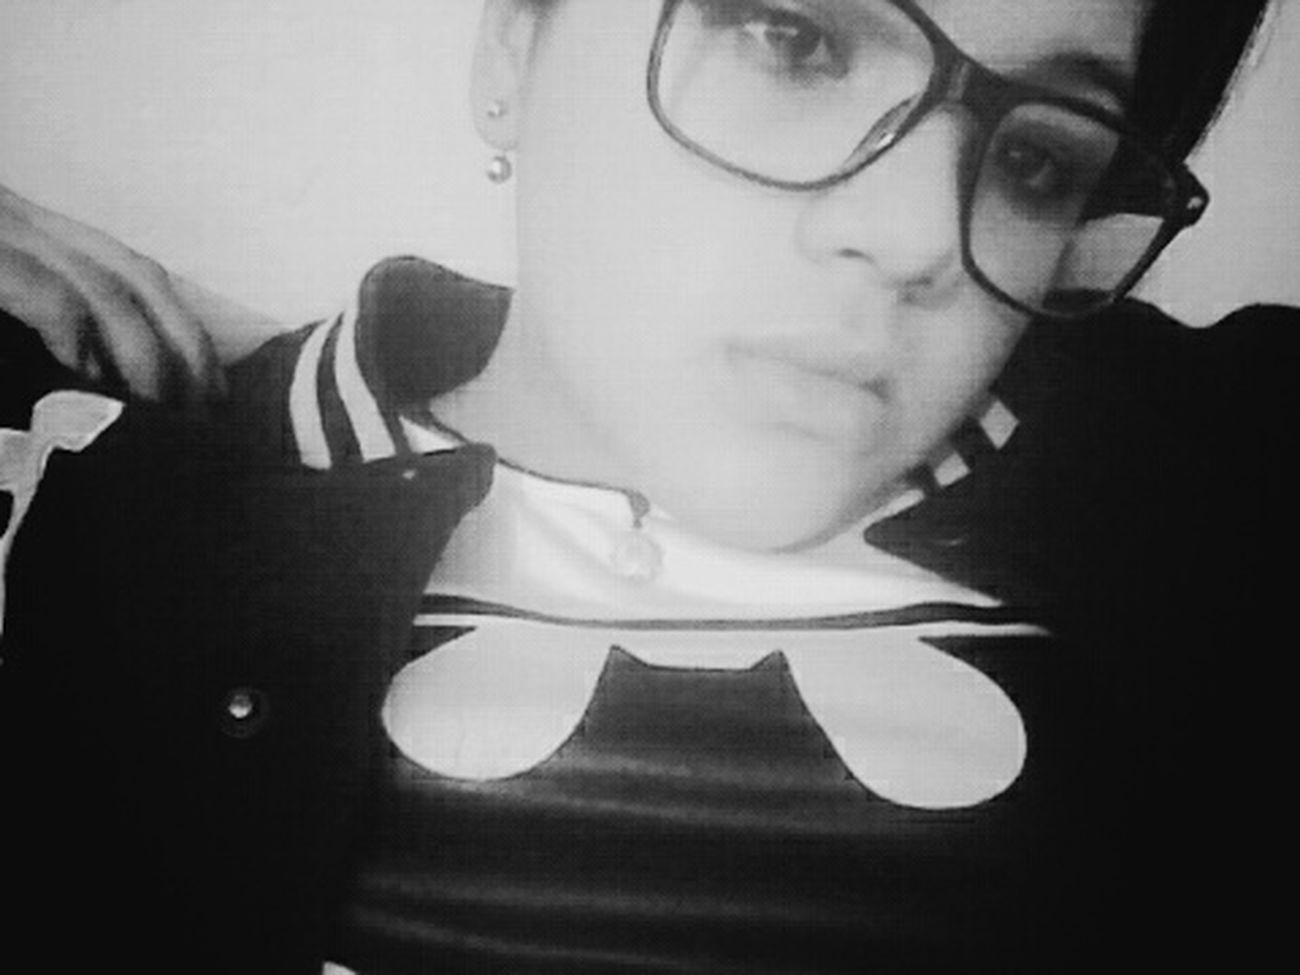 mi cara de culo♡✌ Black And White Hello WorldLesbian ♥ Lesbianlove